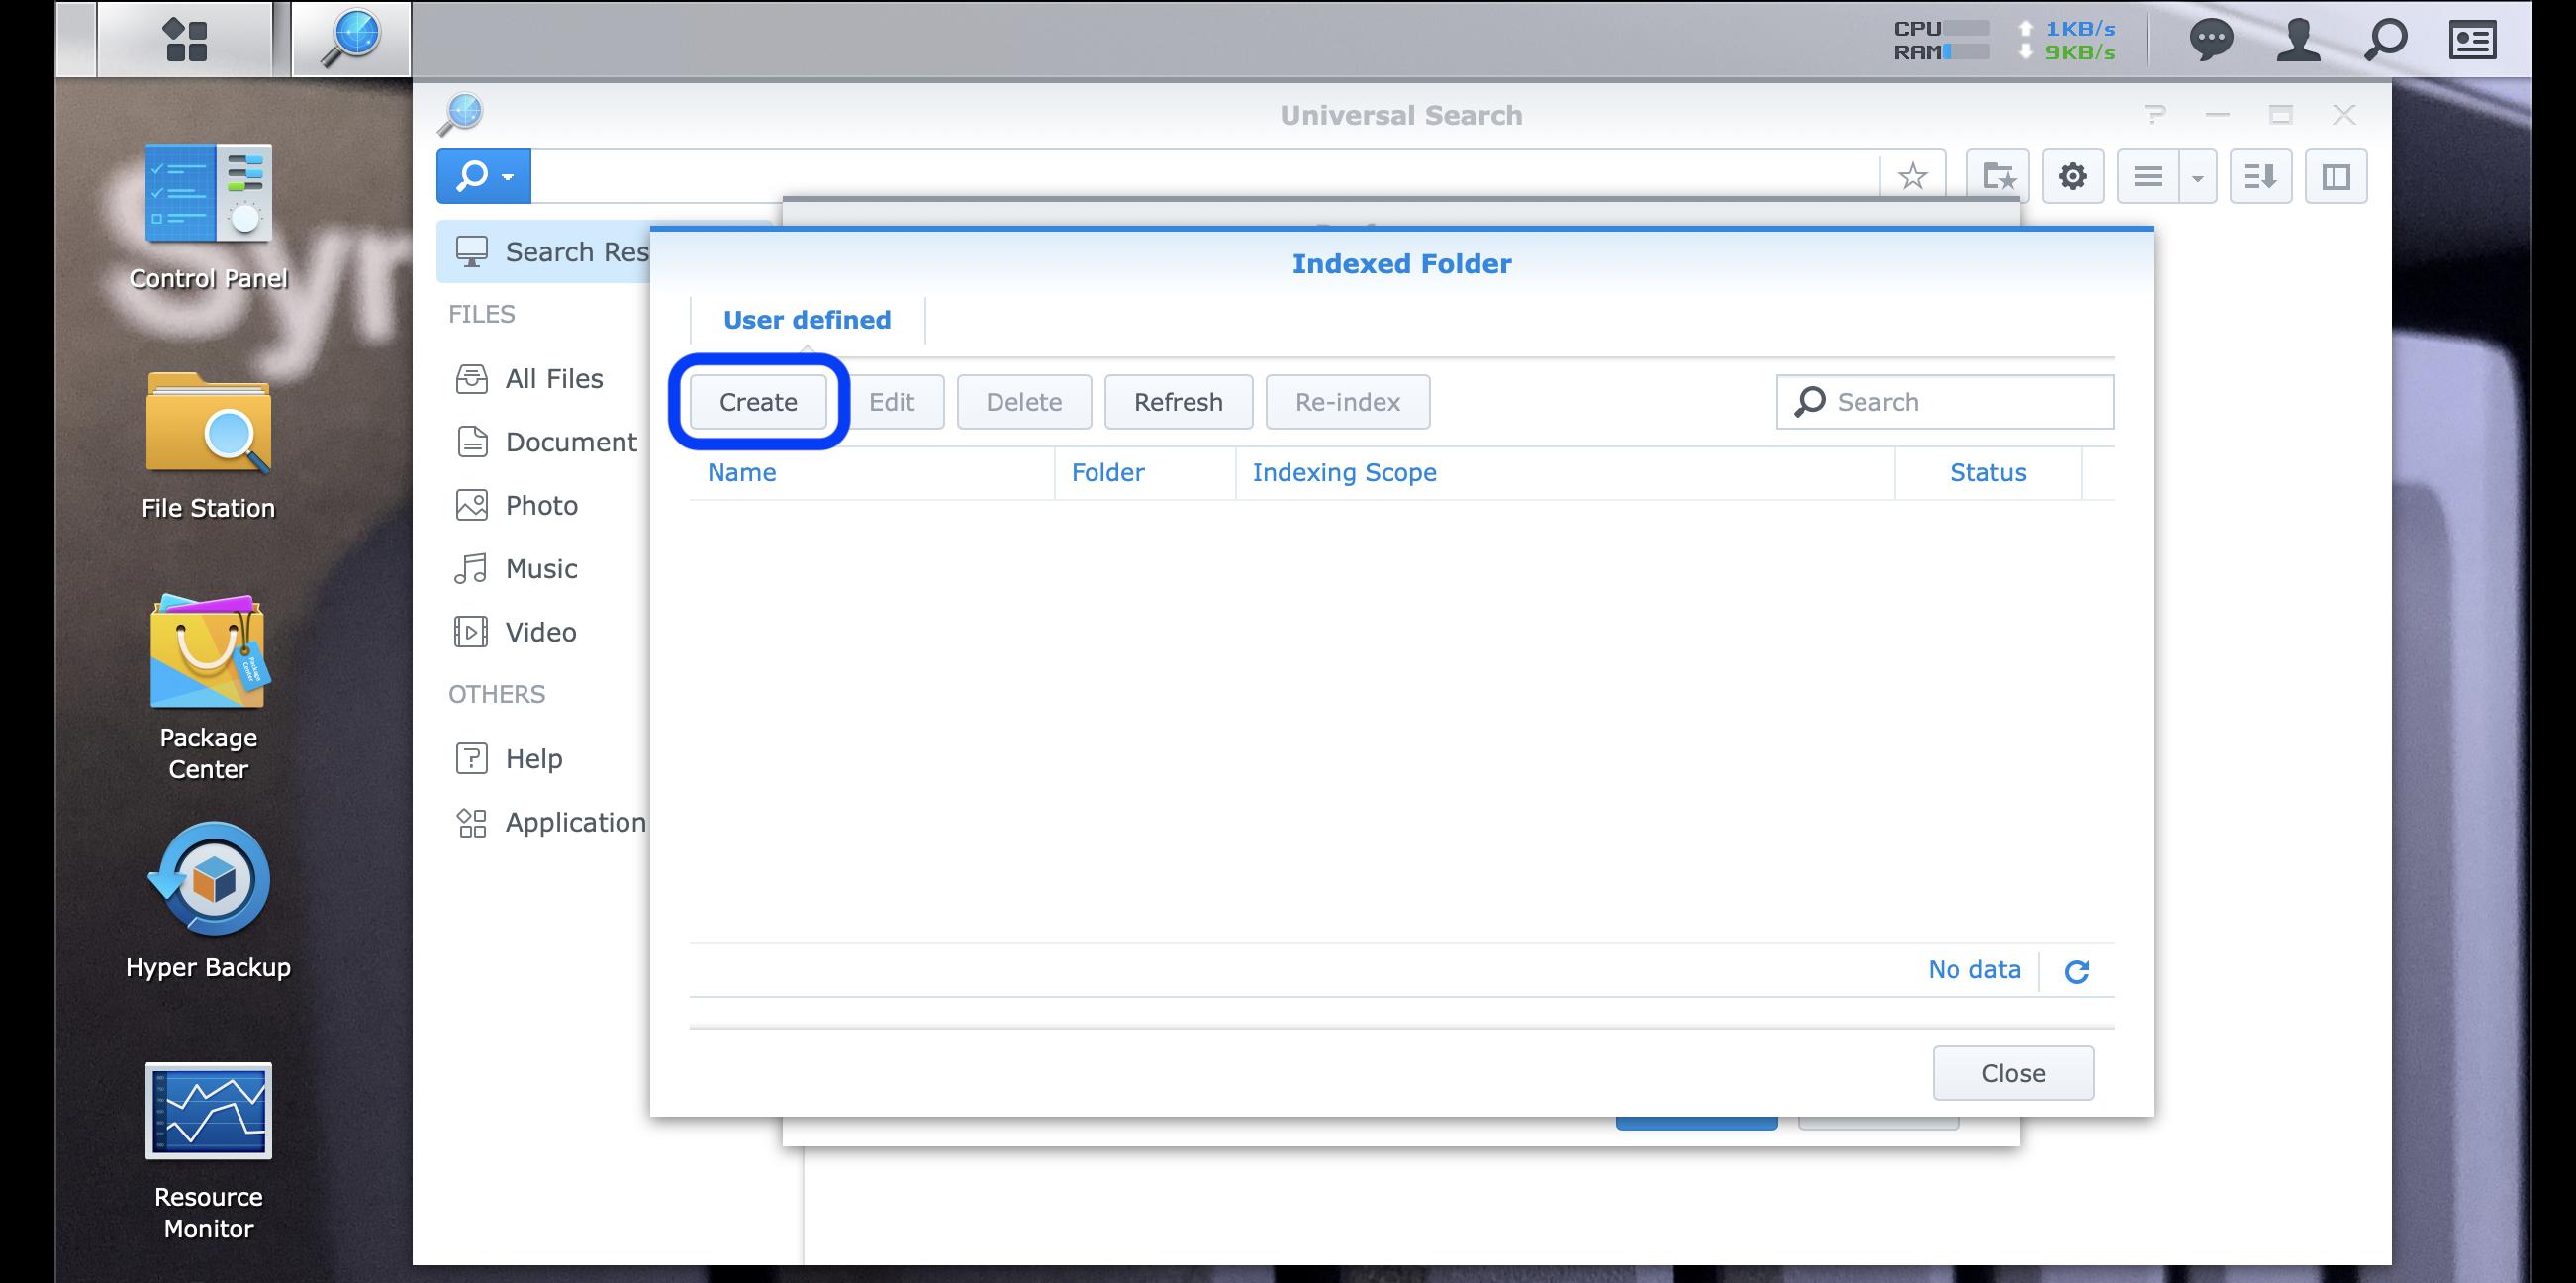 10-20210211-Universal Search Setup 3.png